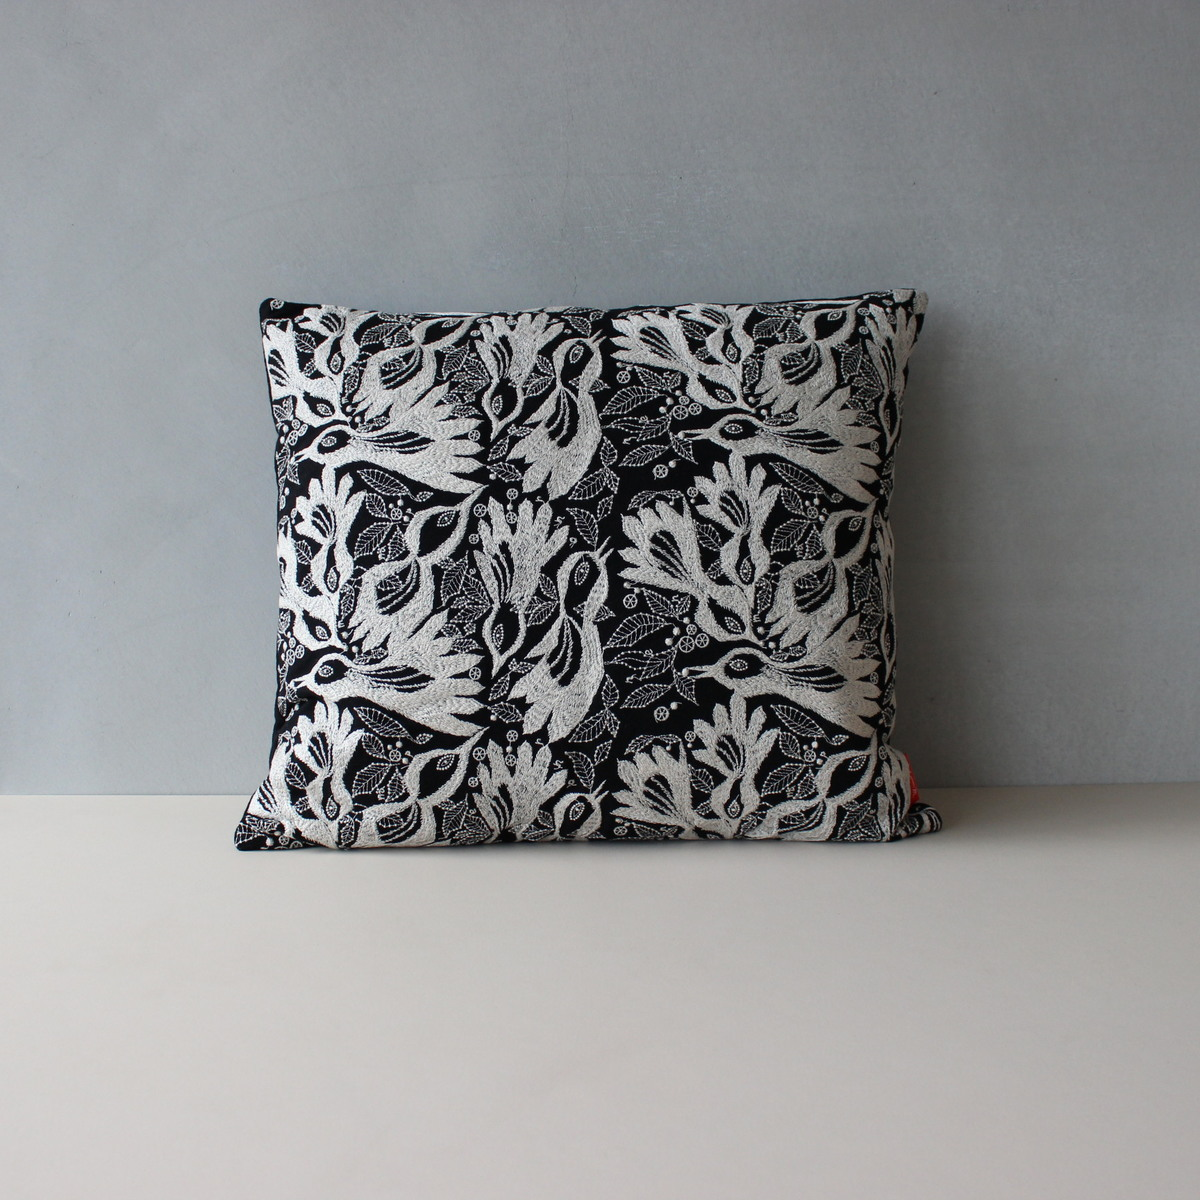 【Akira Minagawa Limited Edition Accessory Collection 2018】 Carnival cushion, 43×48cm 181(ブラック) クッション ミナペルホネン クヴァドラ 皆川明 日本限定30セット